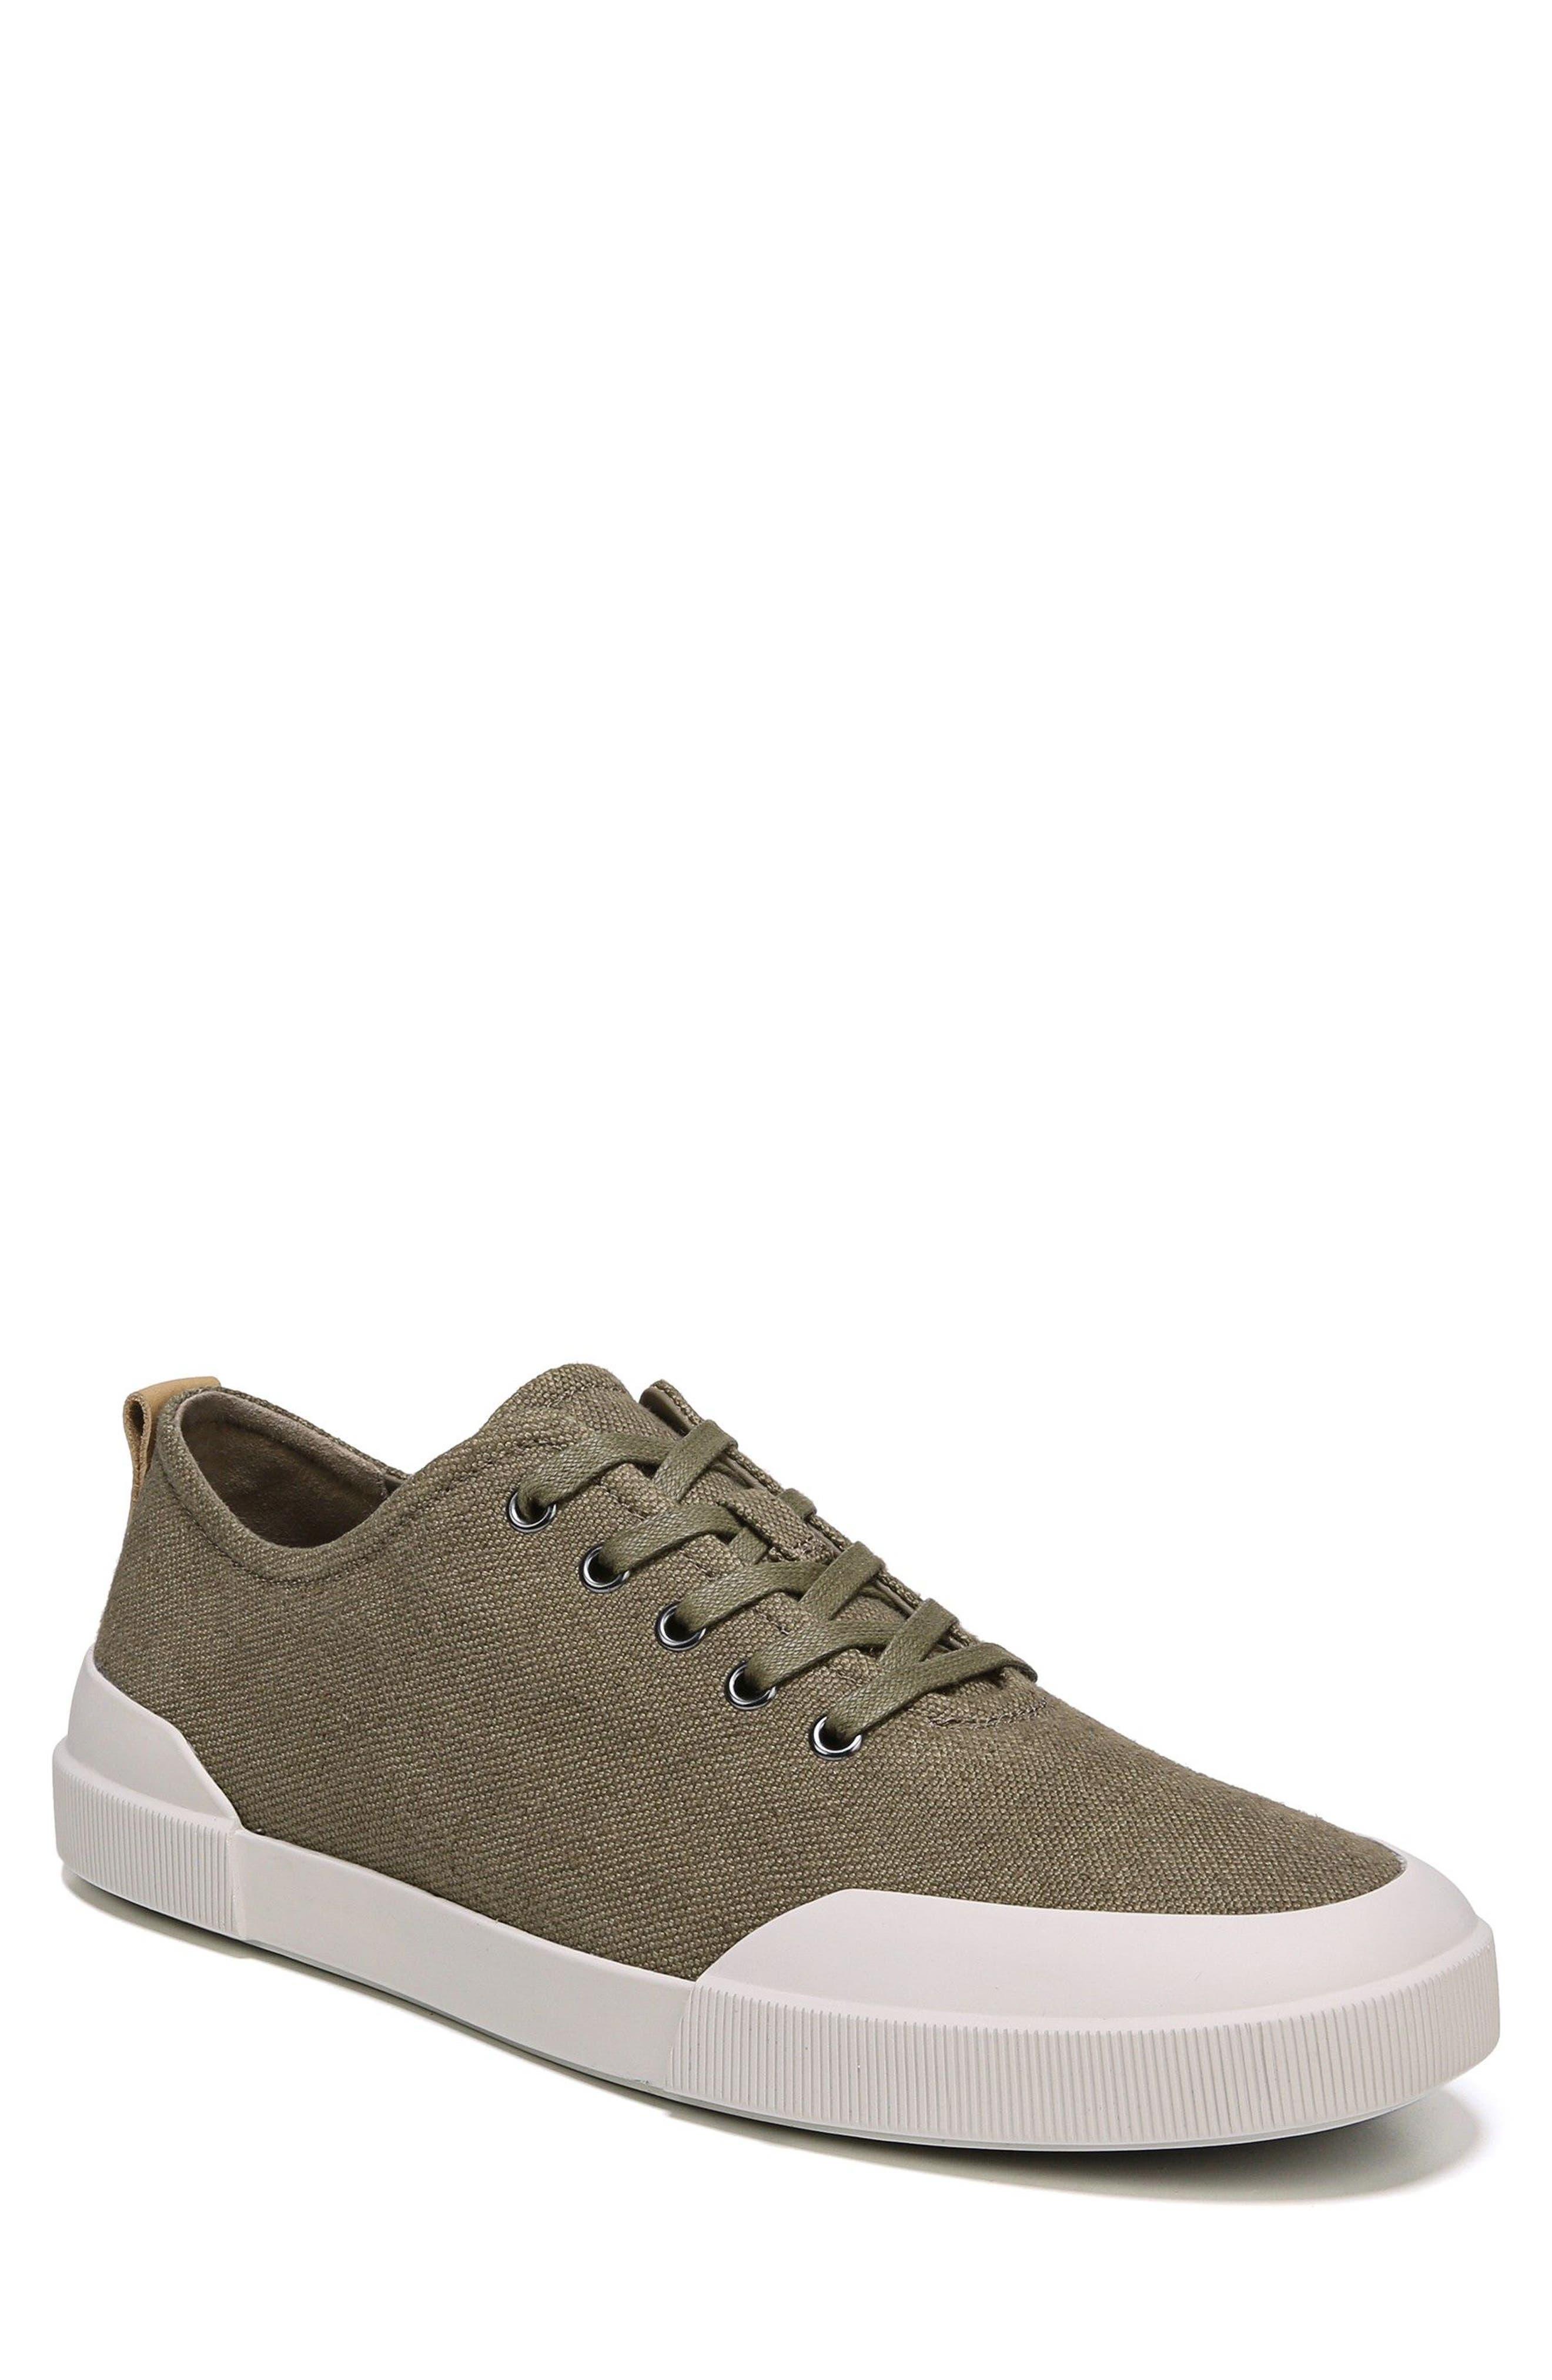 Victor Low Top Sneaker,                         Main,                         color, Flint/ Cuoio